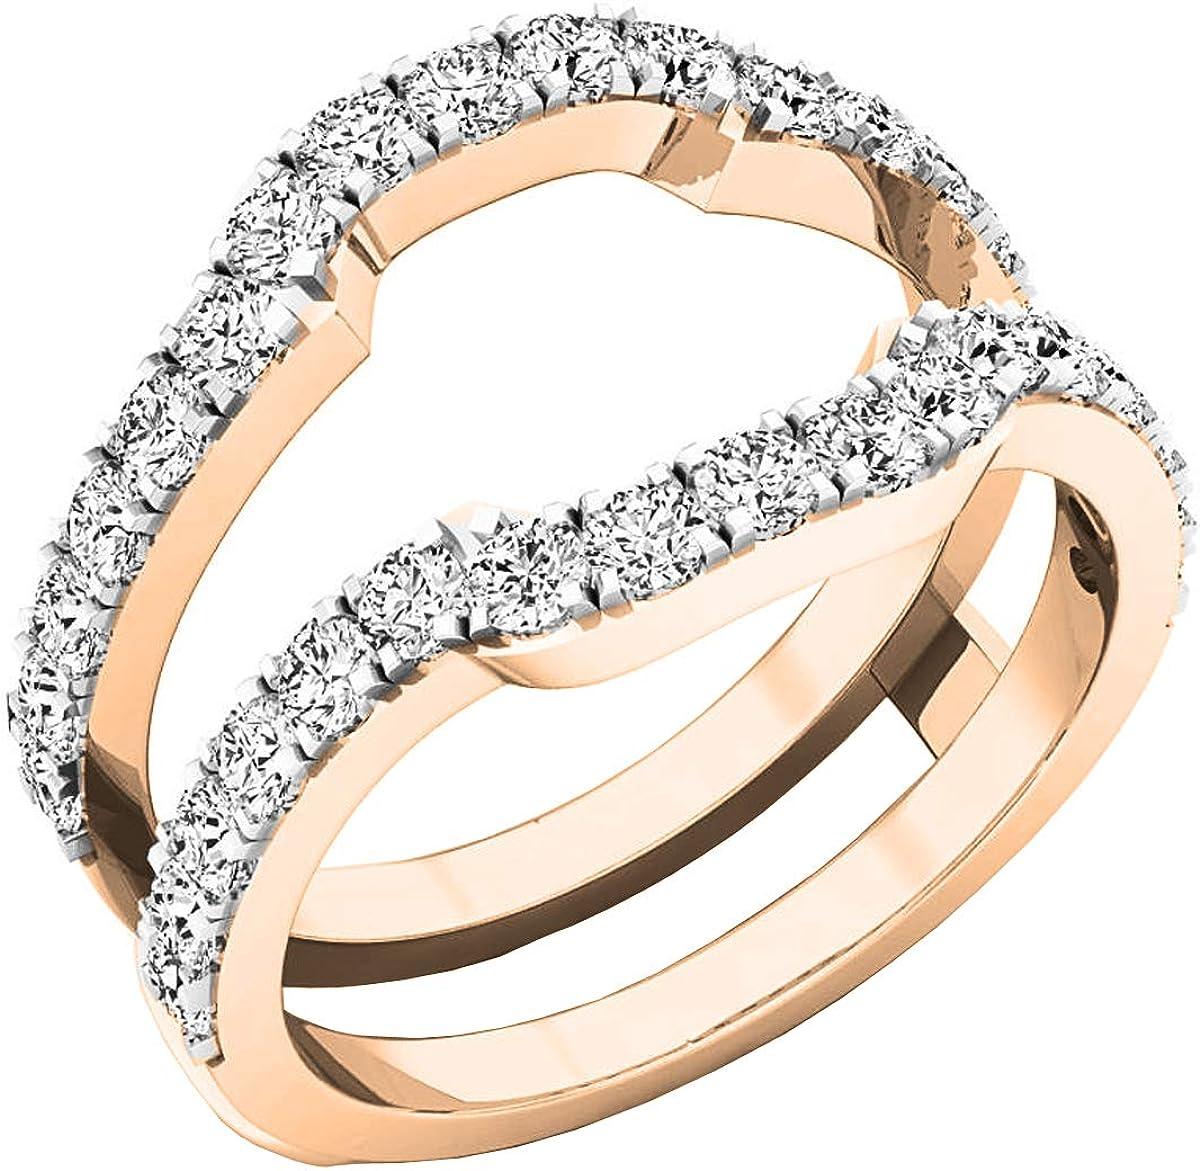 Dazzlingrock Collection Diamond Wedding Band Enhancer Guard Ring from 1/4 Carat to 1 Carat White Diamond Ring in 10K Rose Gold